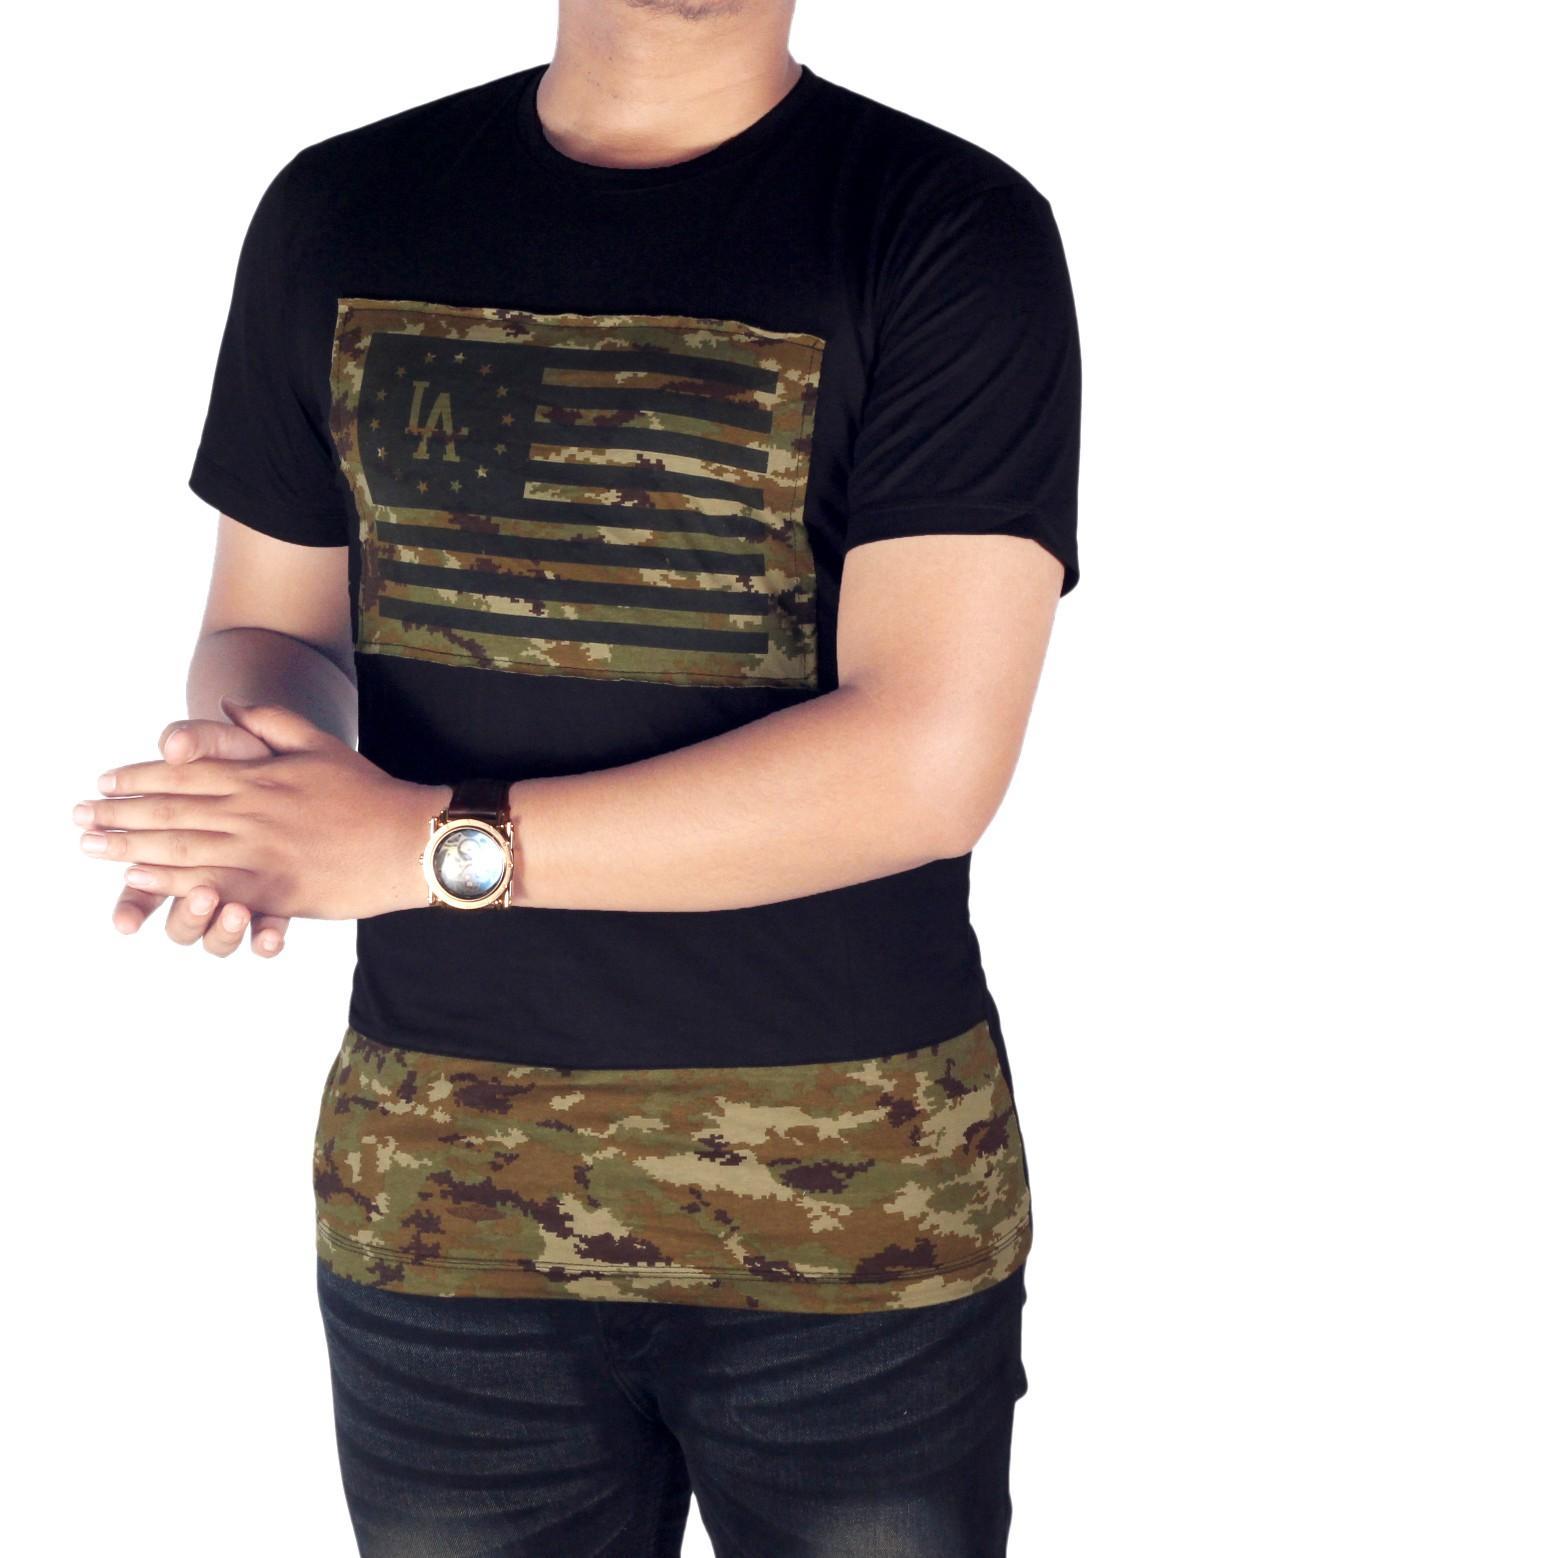 Dgm_Fashion1 Kaos Distro Hitam Army Combinasi/ Baju Kaos Distro Hitam Polos/ Kaos Anak Motor/Kaos Retro/ Kaos Hitam Polos/Baju YOUNG LEX/Kaos Polos/Kaos Oblong/Kaos Distro/Kaos Casual/Kaos Hitam/Kaos Raglan/T-Shirt Man NX 5635